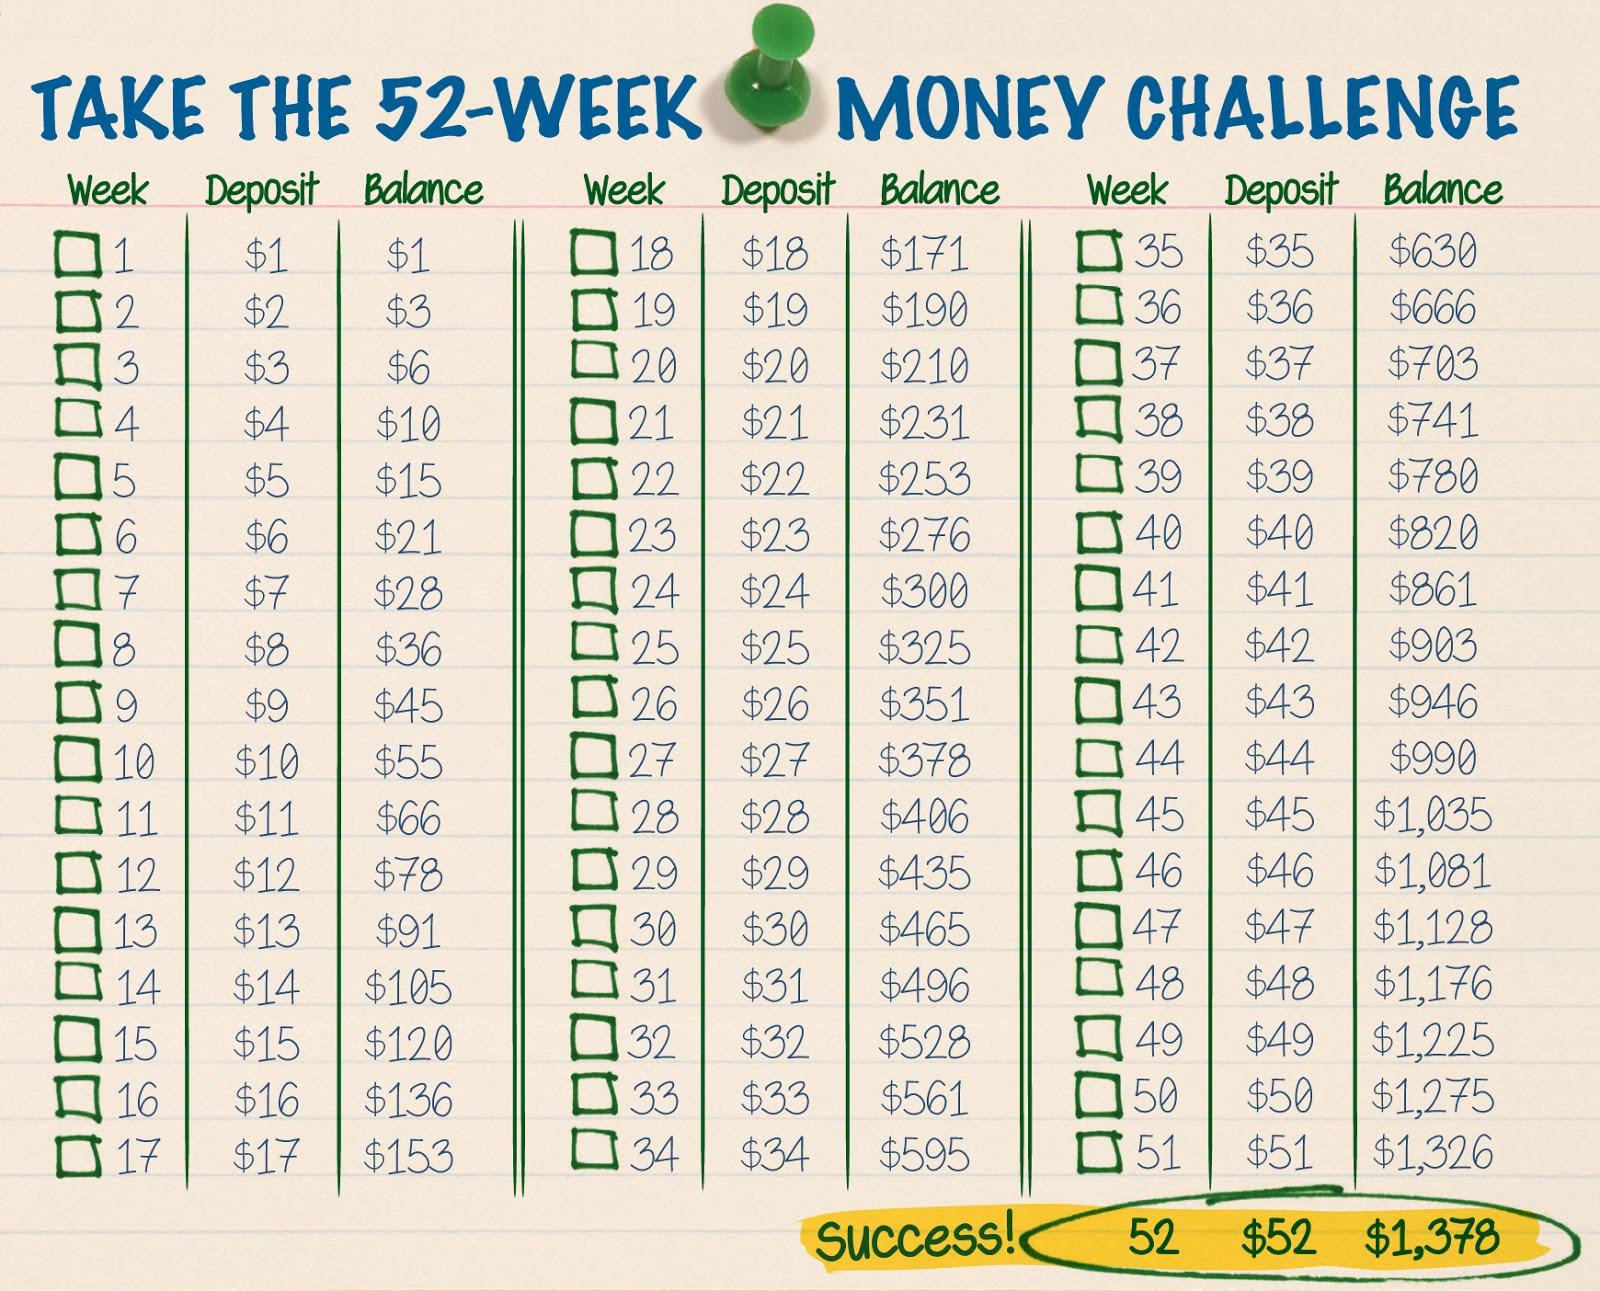 52 Week Challenge Biweekly Next to each week/amount